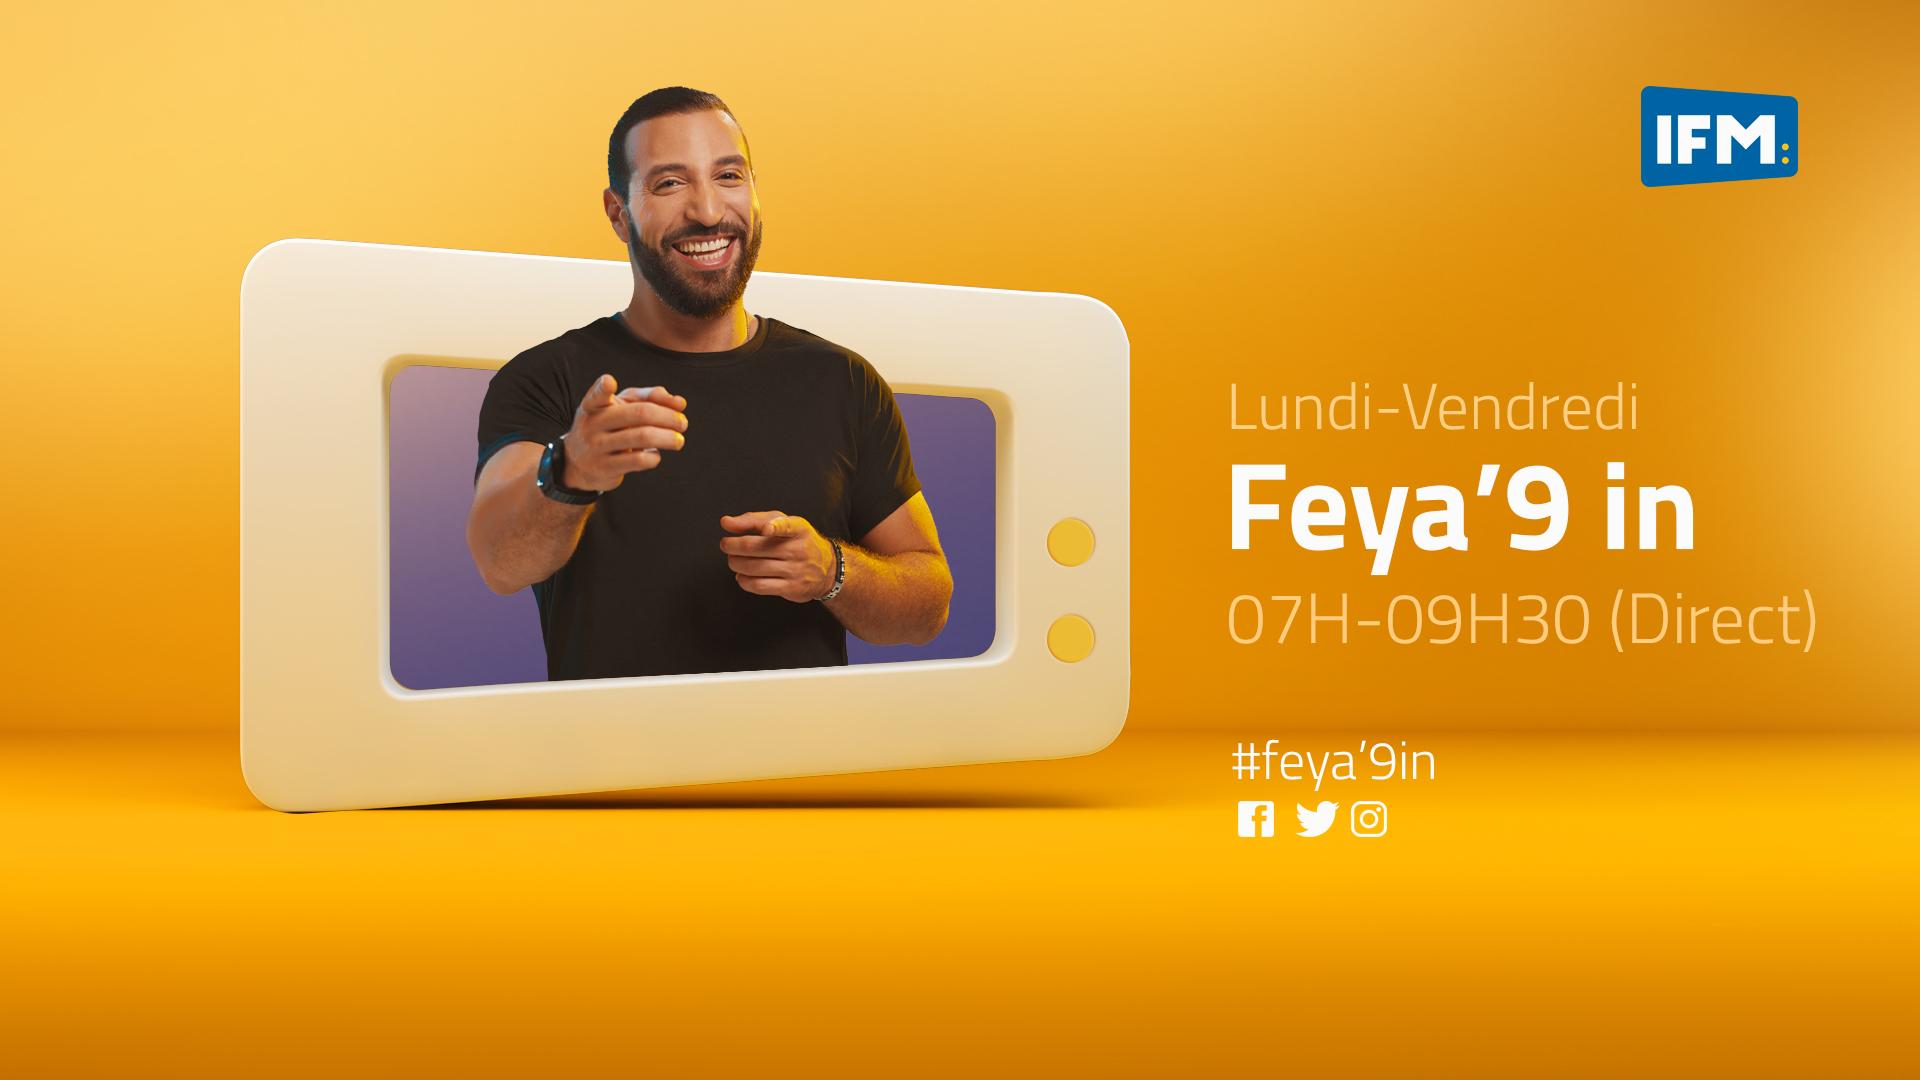 Feya9'in Feya9.in Le 13-10-2021